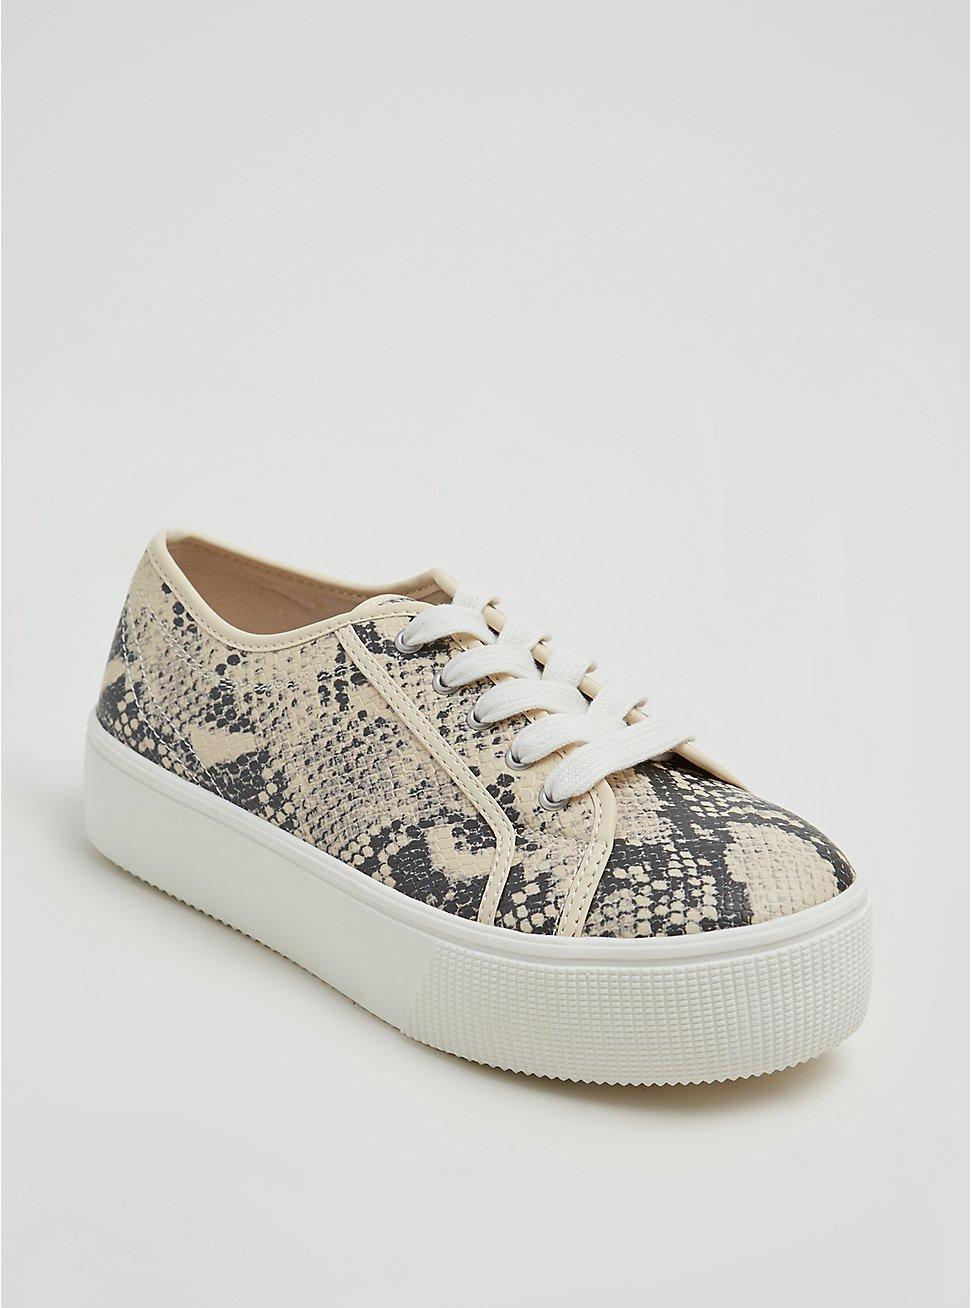 Plus Size Snakeskin Print Faux Leather Lace-Up Platform Sneaker (WW), ANIMAL, hi-res